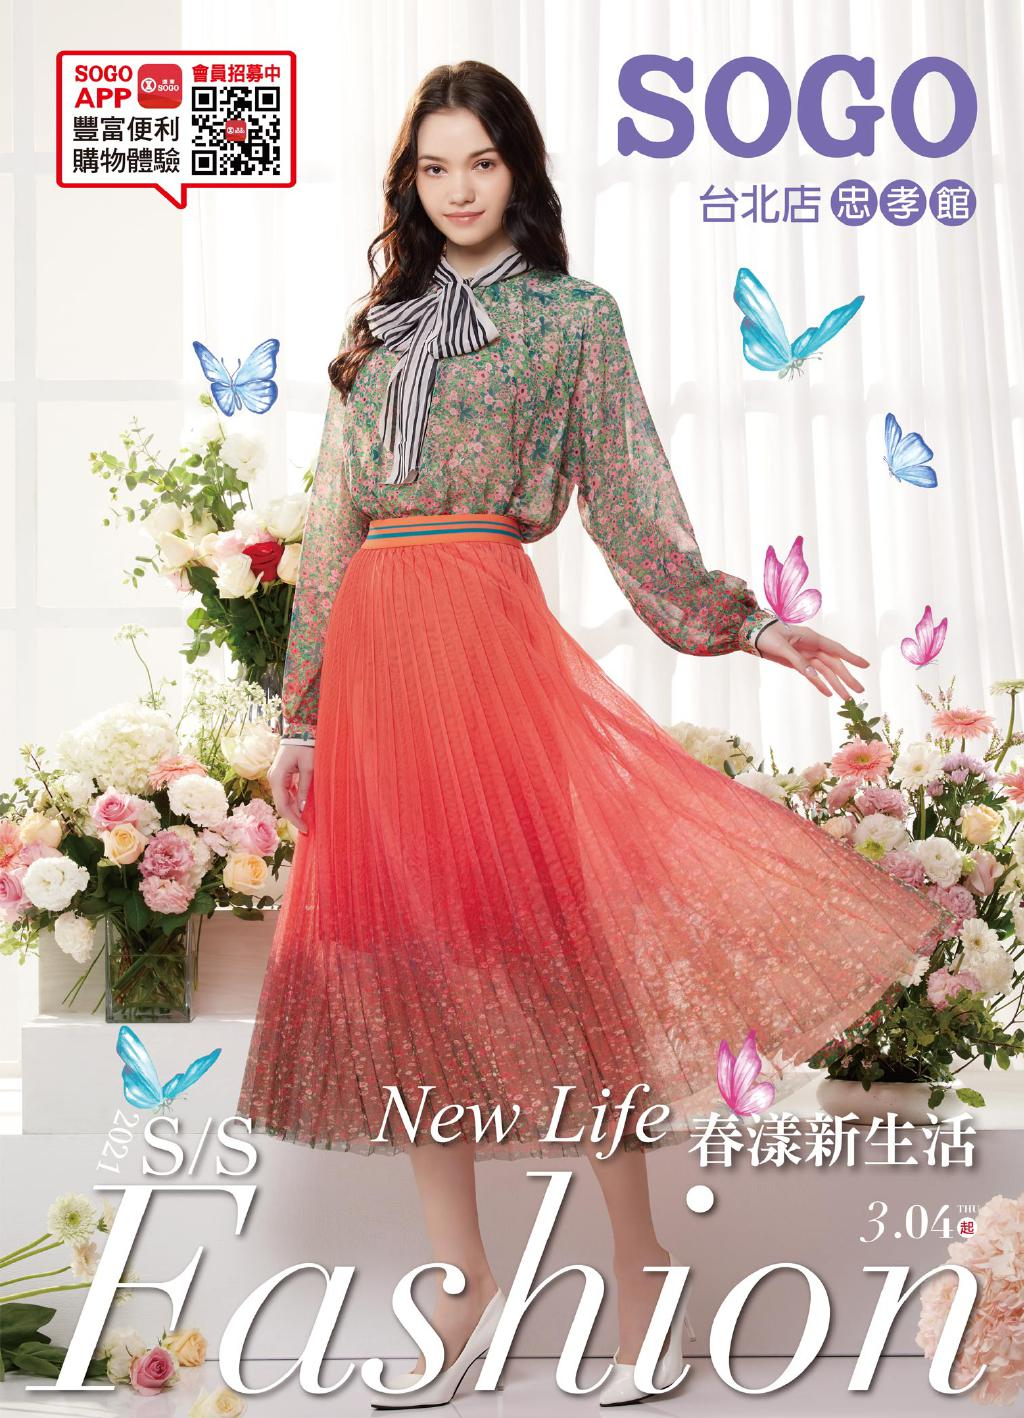 SOGO《台北忠孝館》DM 「New Life New Fashion春漾新生活」【2021/3/31 止】